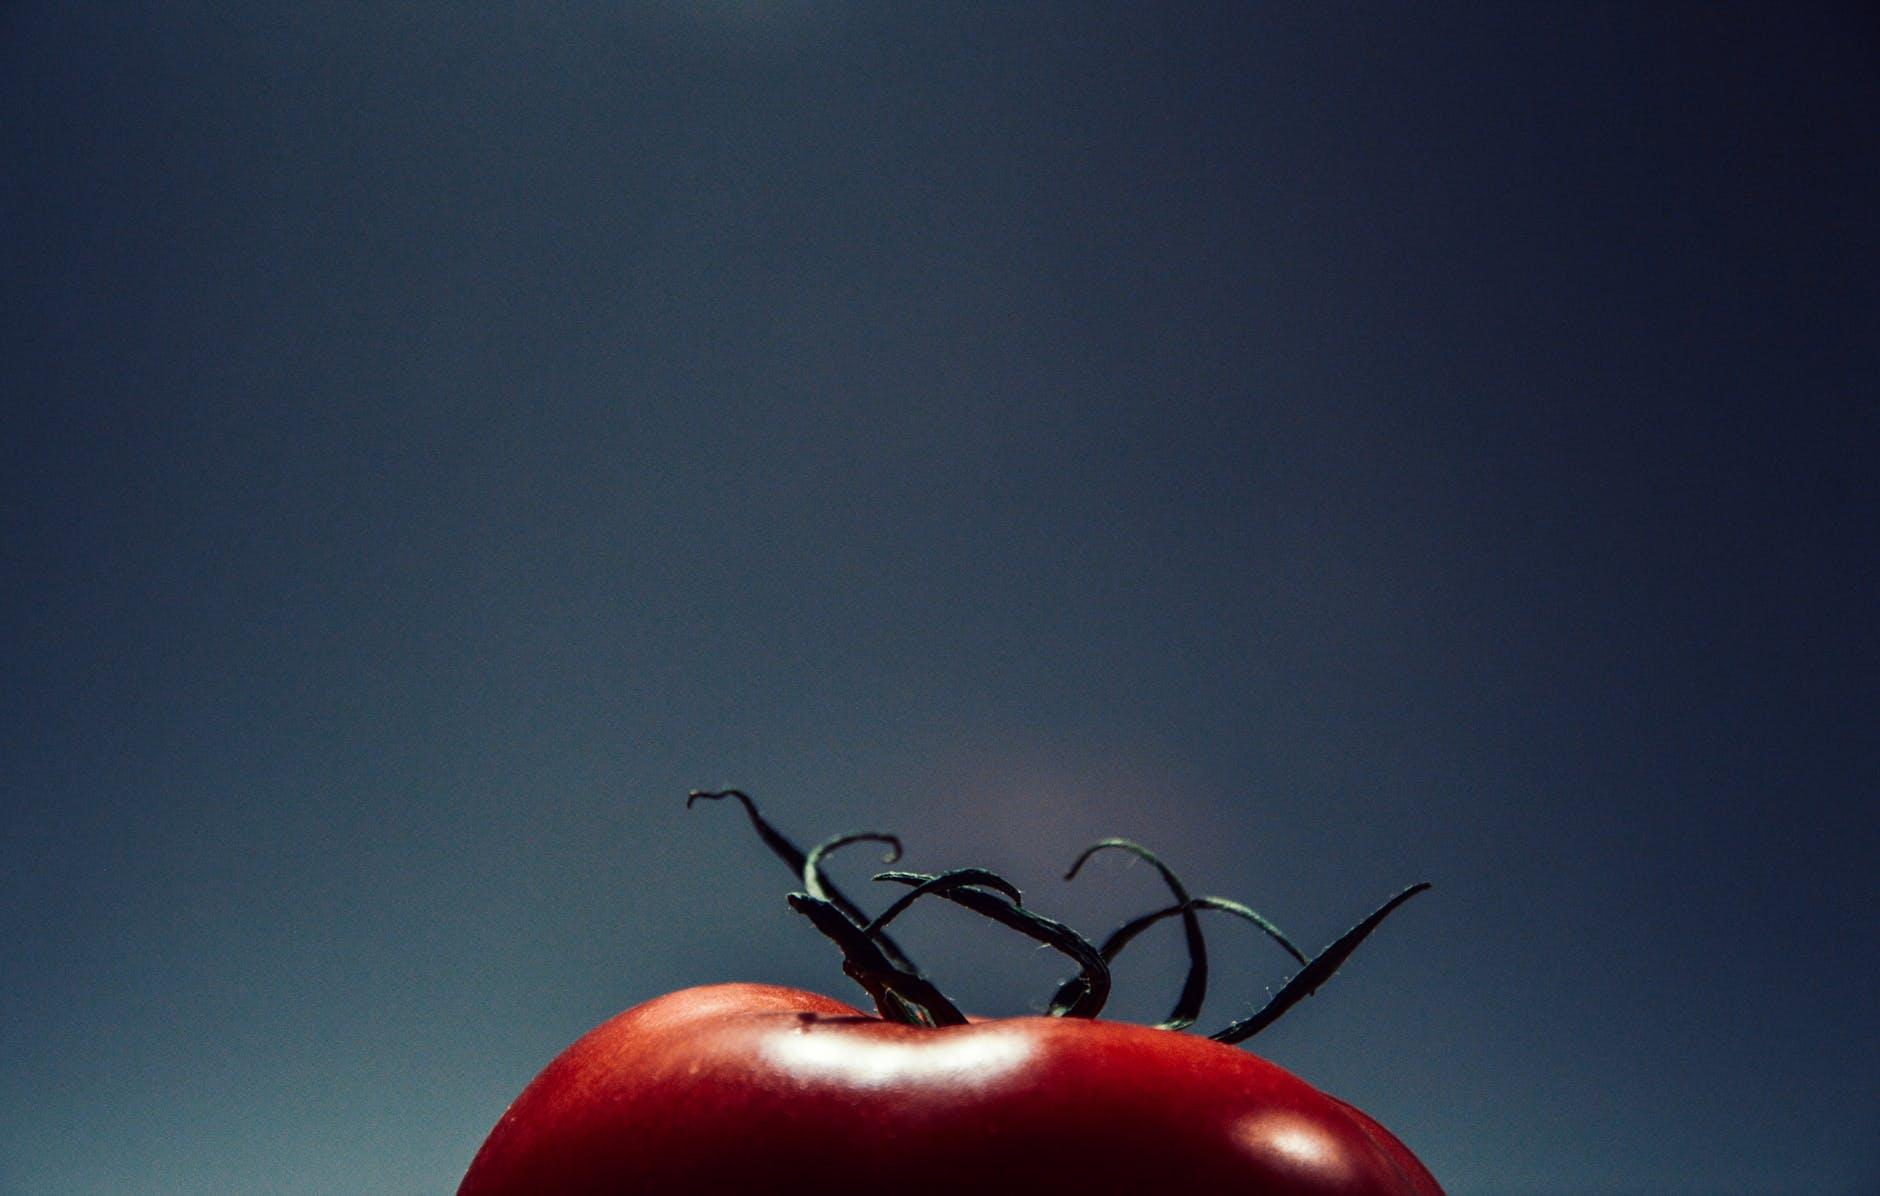 night-tomato.jpg